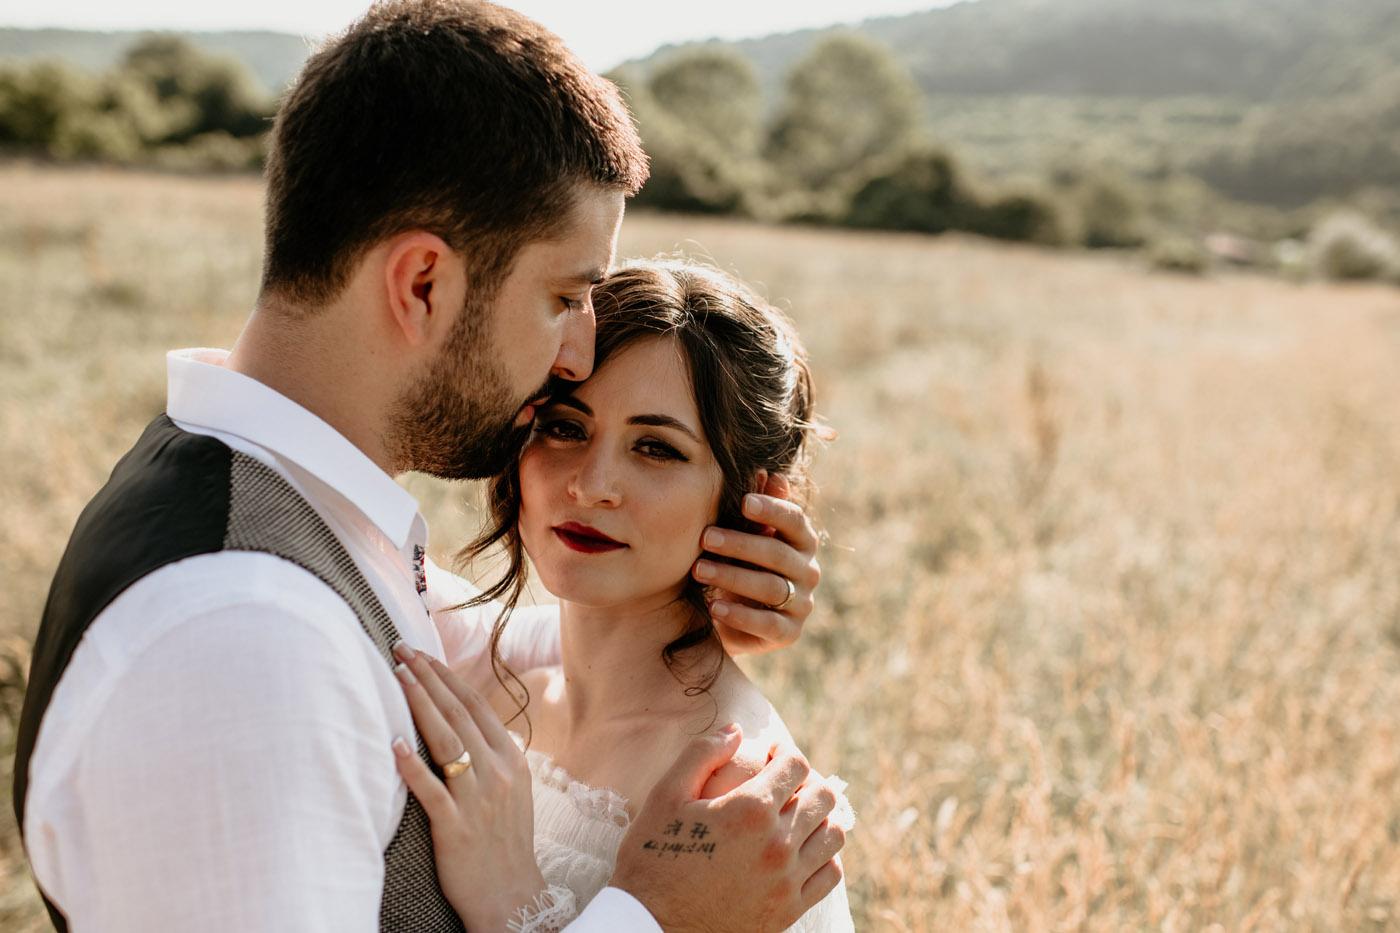 düğün fotoğrafçısı, düğün fotoğrafçısı fiyatları, düğün fotoğrafları, dış mekan düğün fotoğrafları